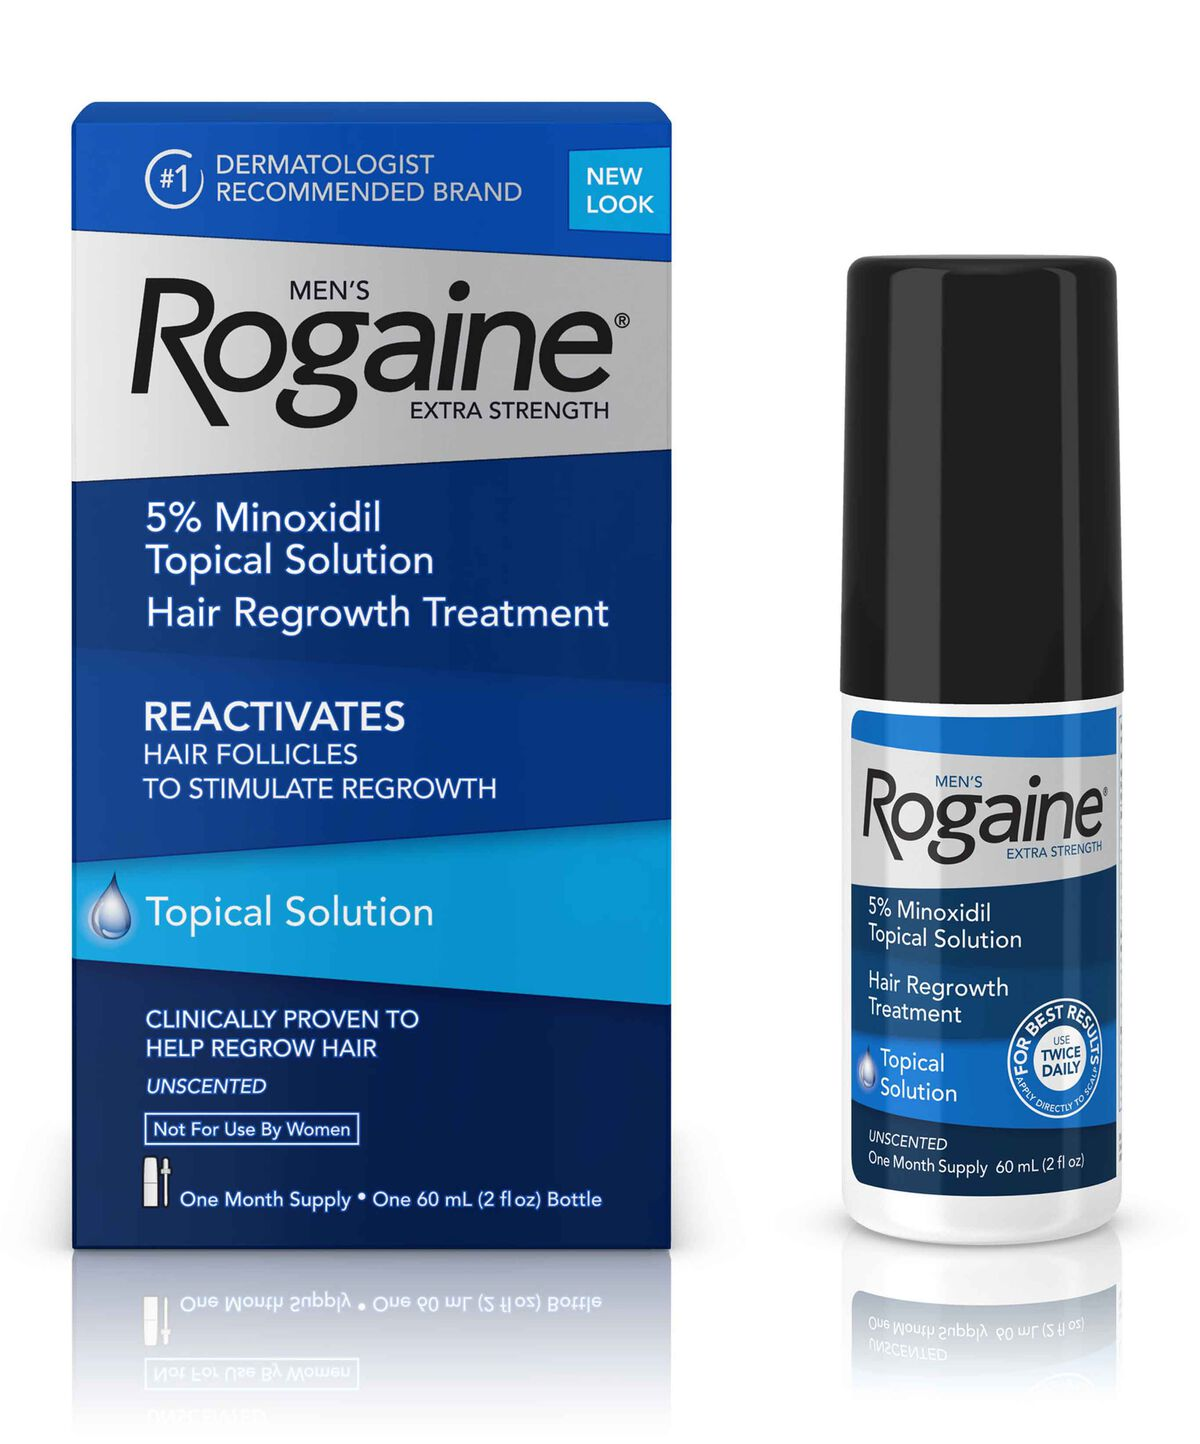 Minoxidil生髮藥物